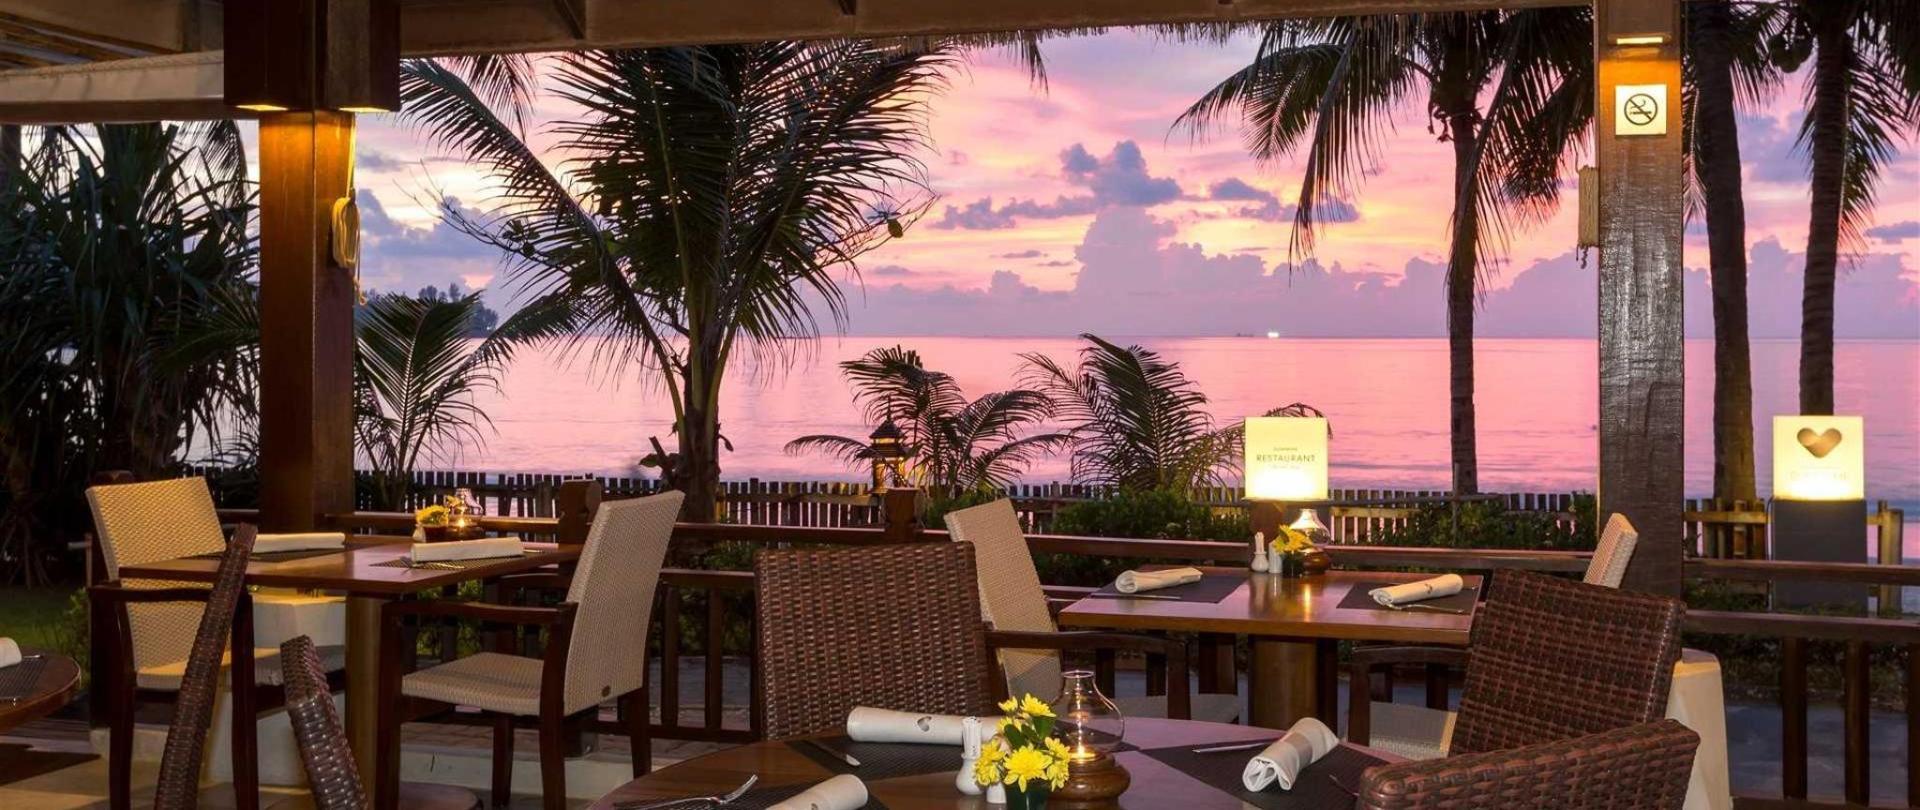 Kamala Beach Resort, ein Sunprime Resort